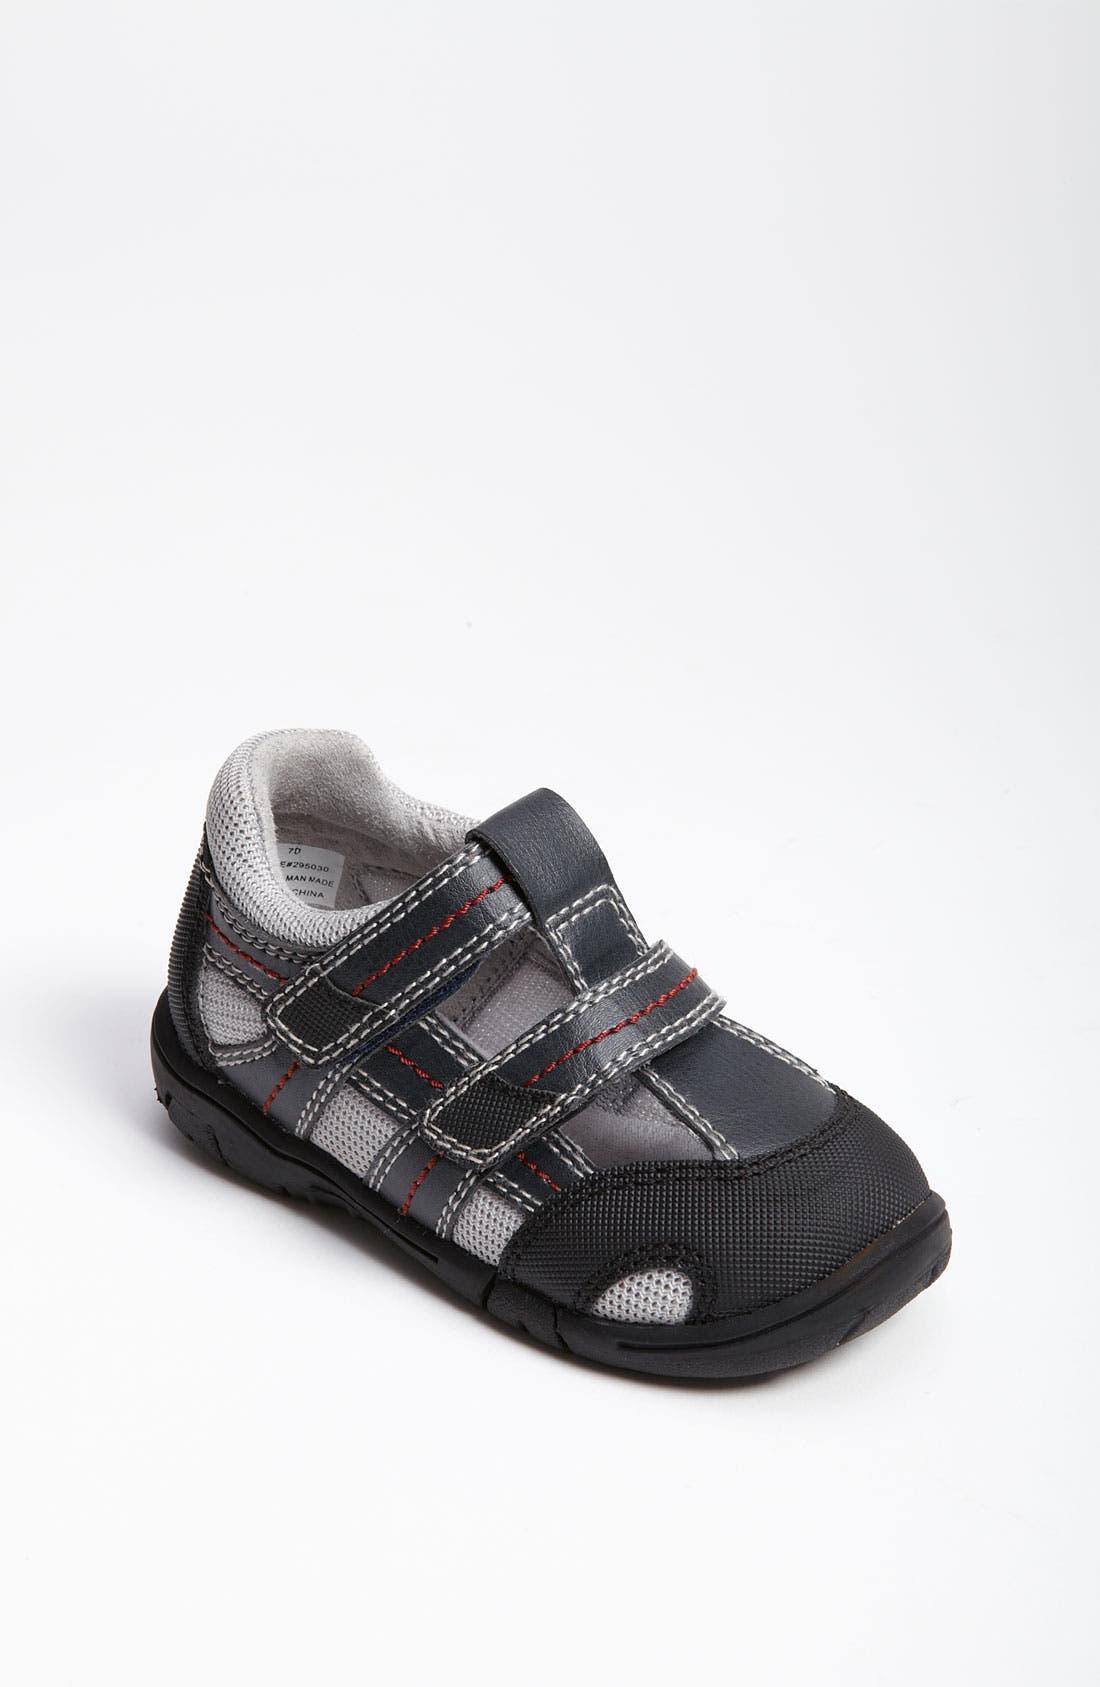 Main Image - Jumping Jacks 'All Terrain' Sneaker (Walker & Toddler)